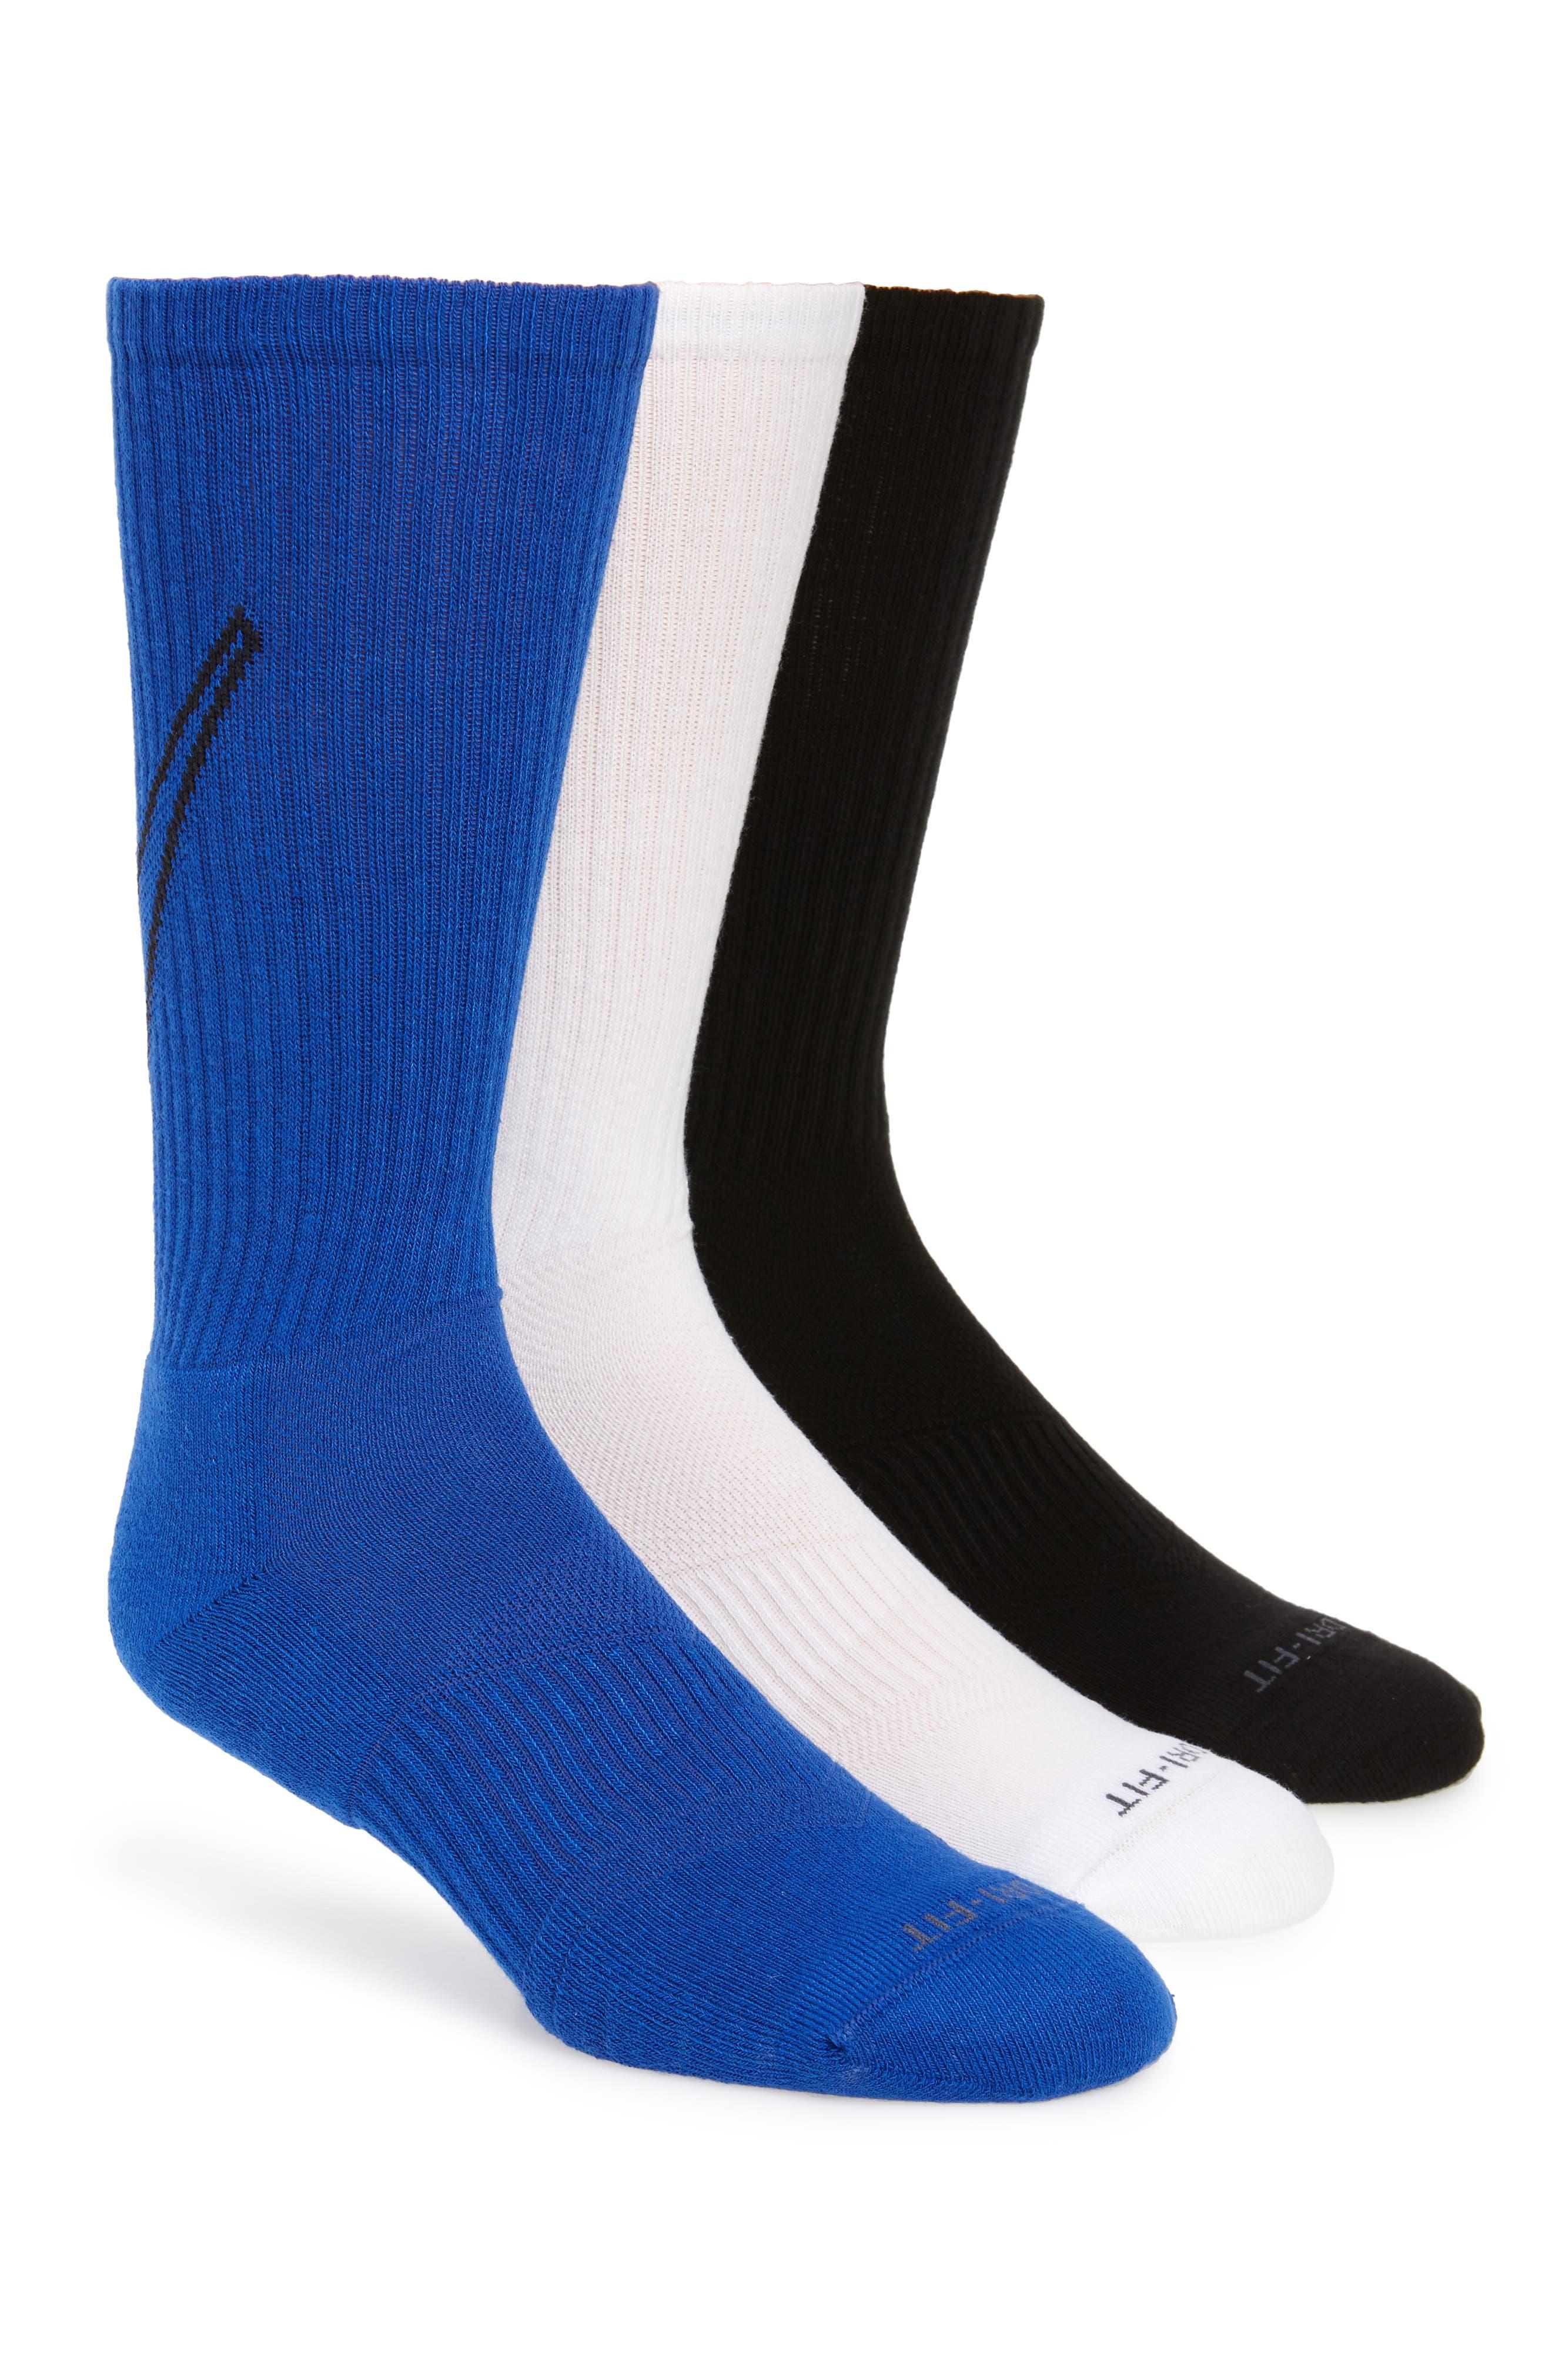 NIKE, Everyday Max Cushion 3-Pack Crew Socks, Main thumbnail 1, color, 100